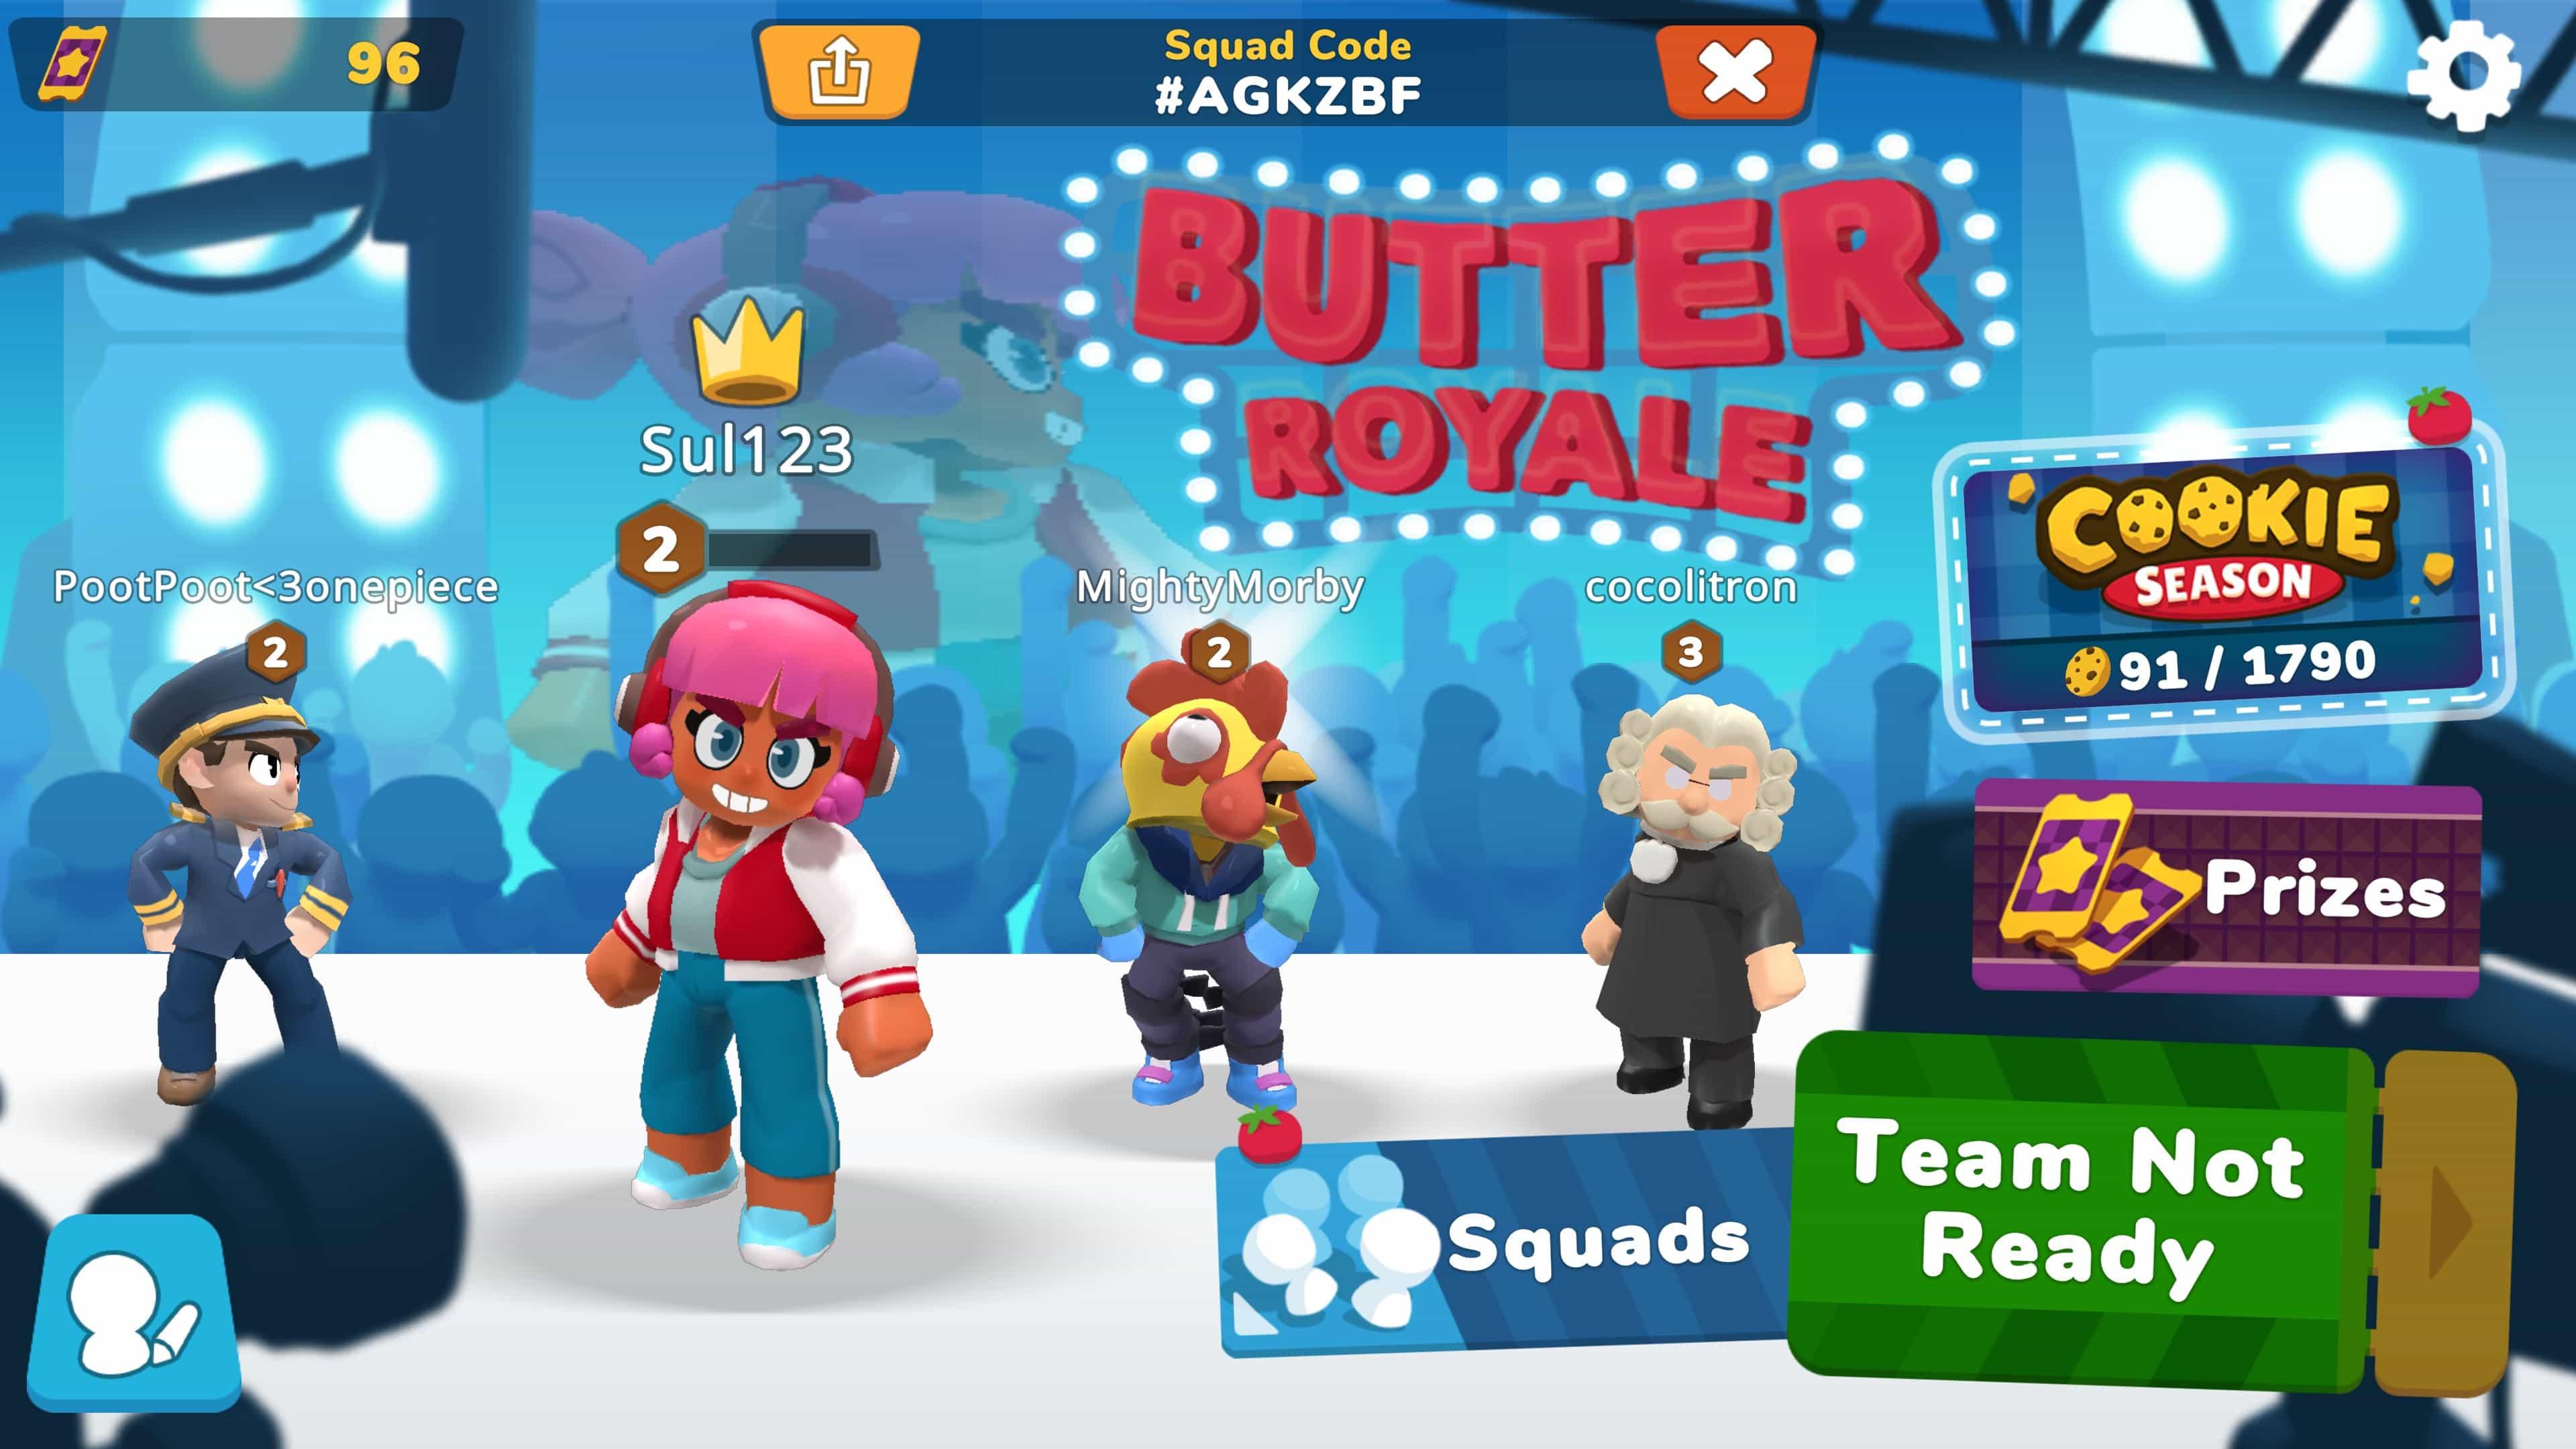 04_Squads